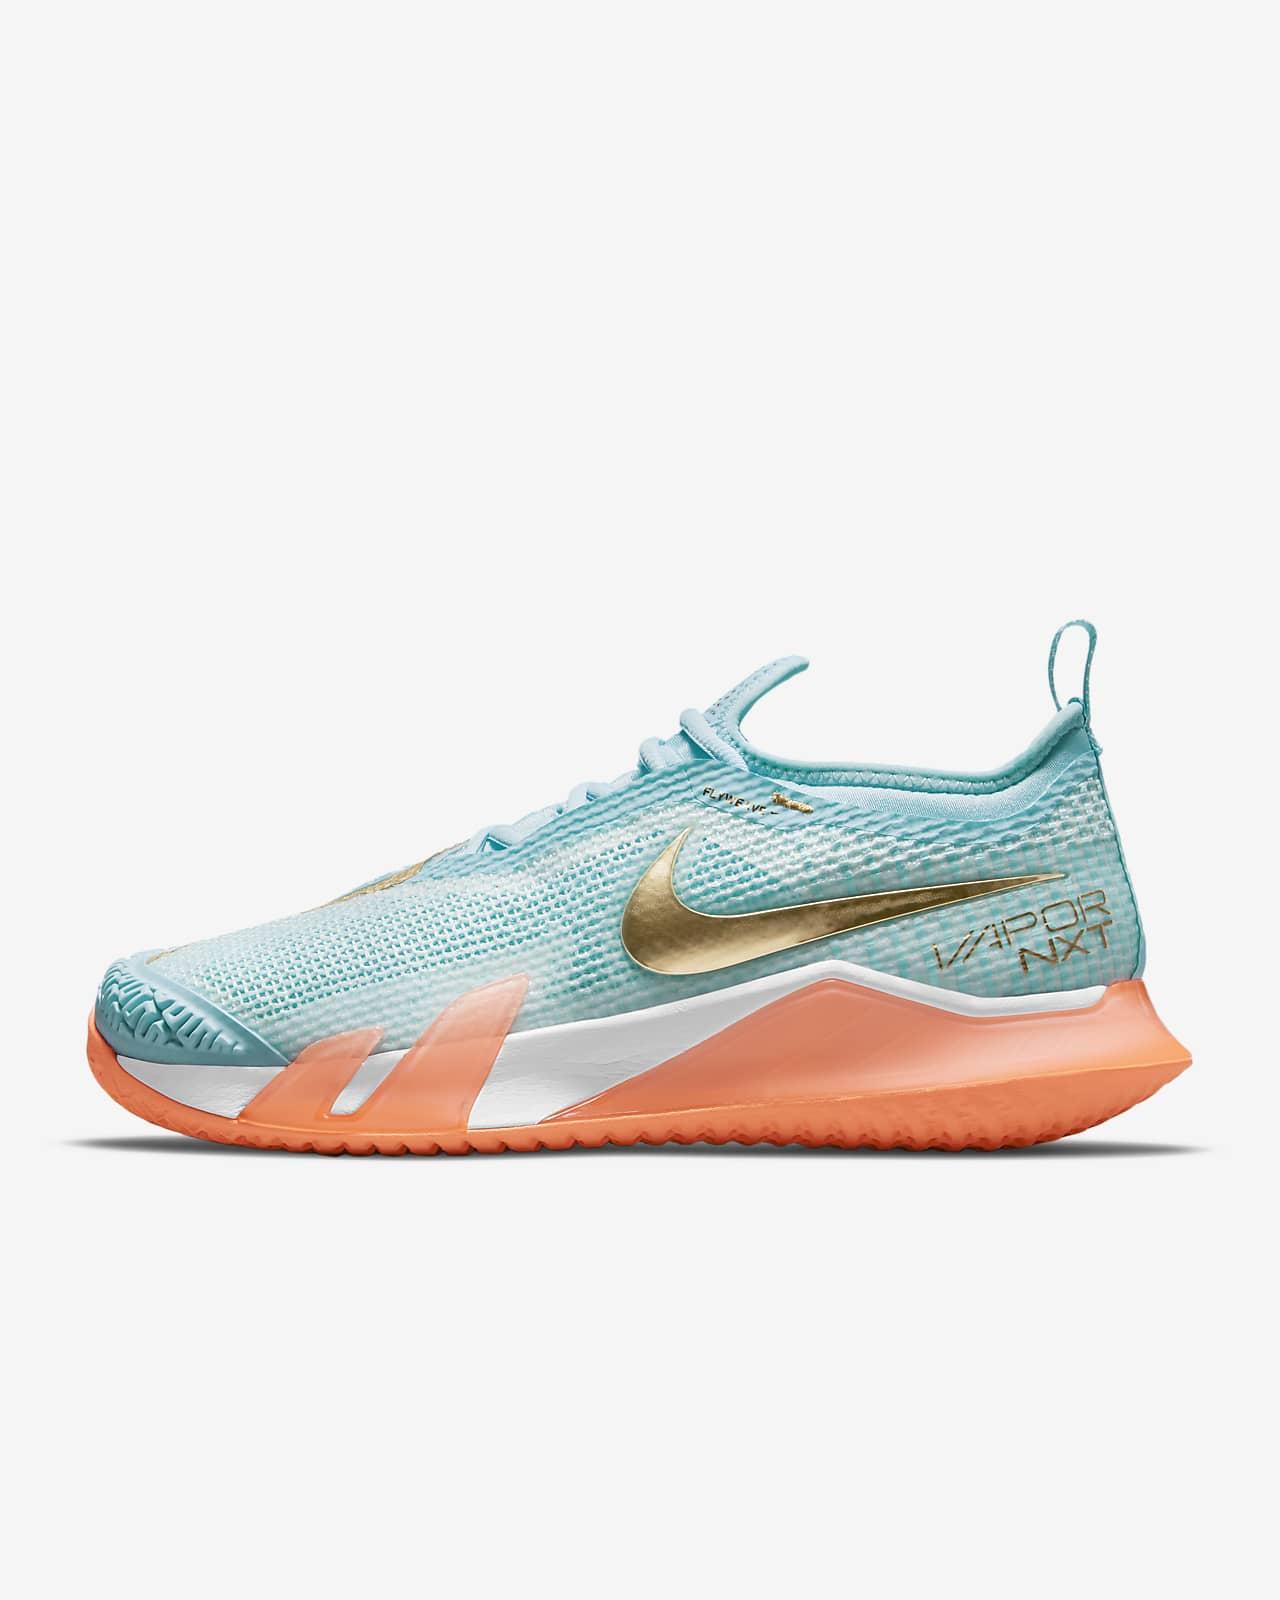 NikeCourt React Vapor NXT Women's Hard Court Tennis Shoe